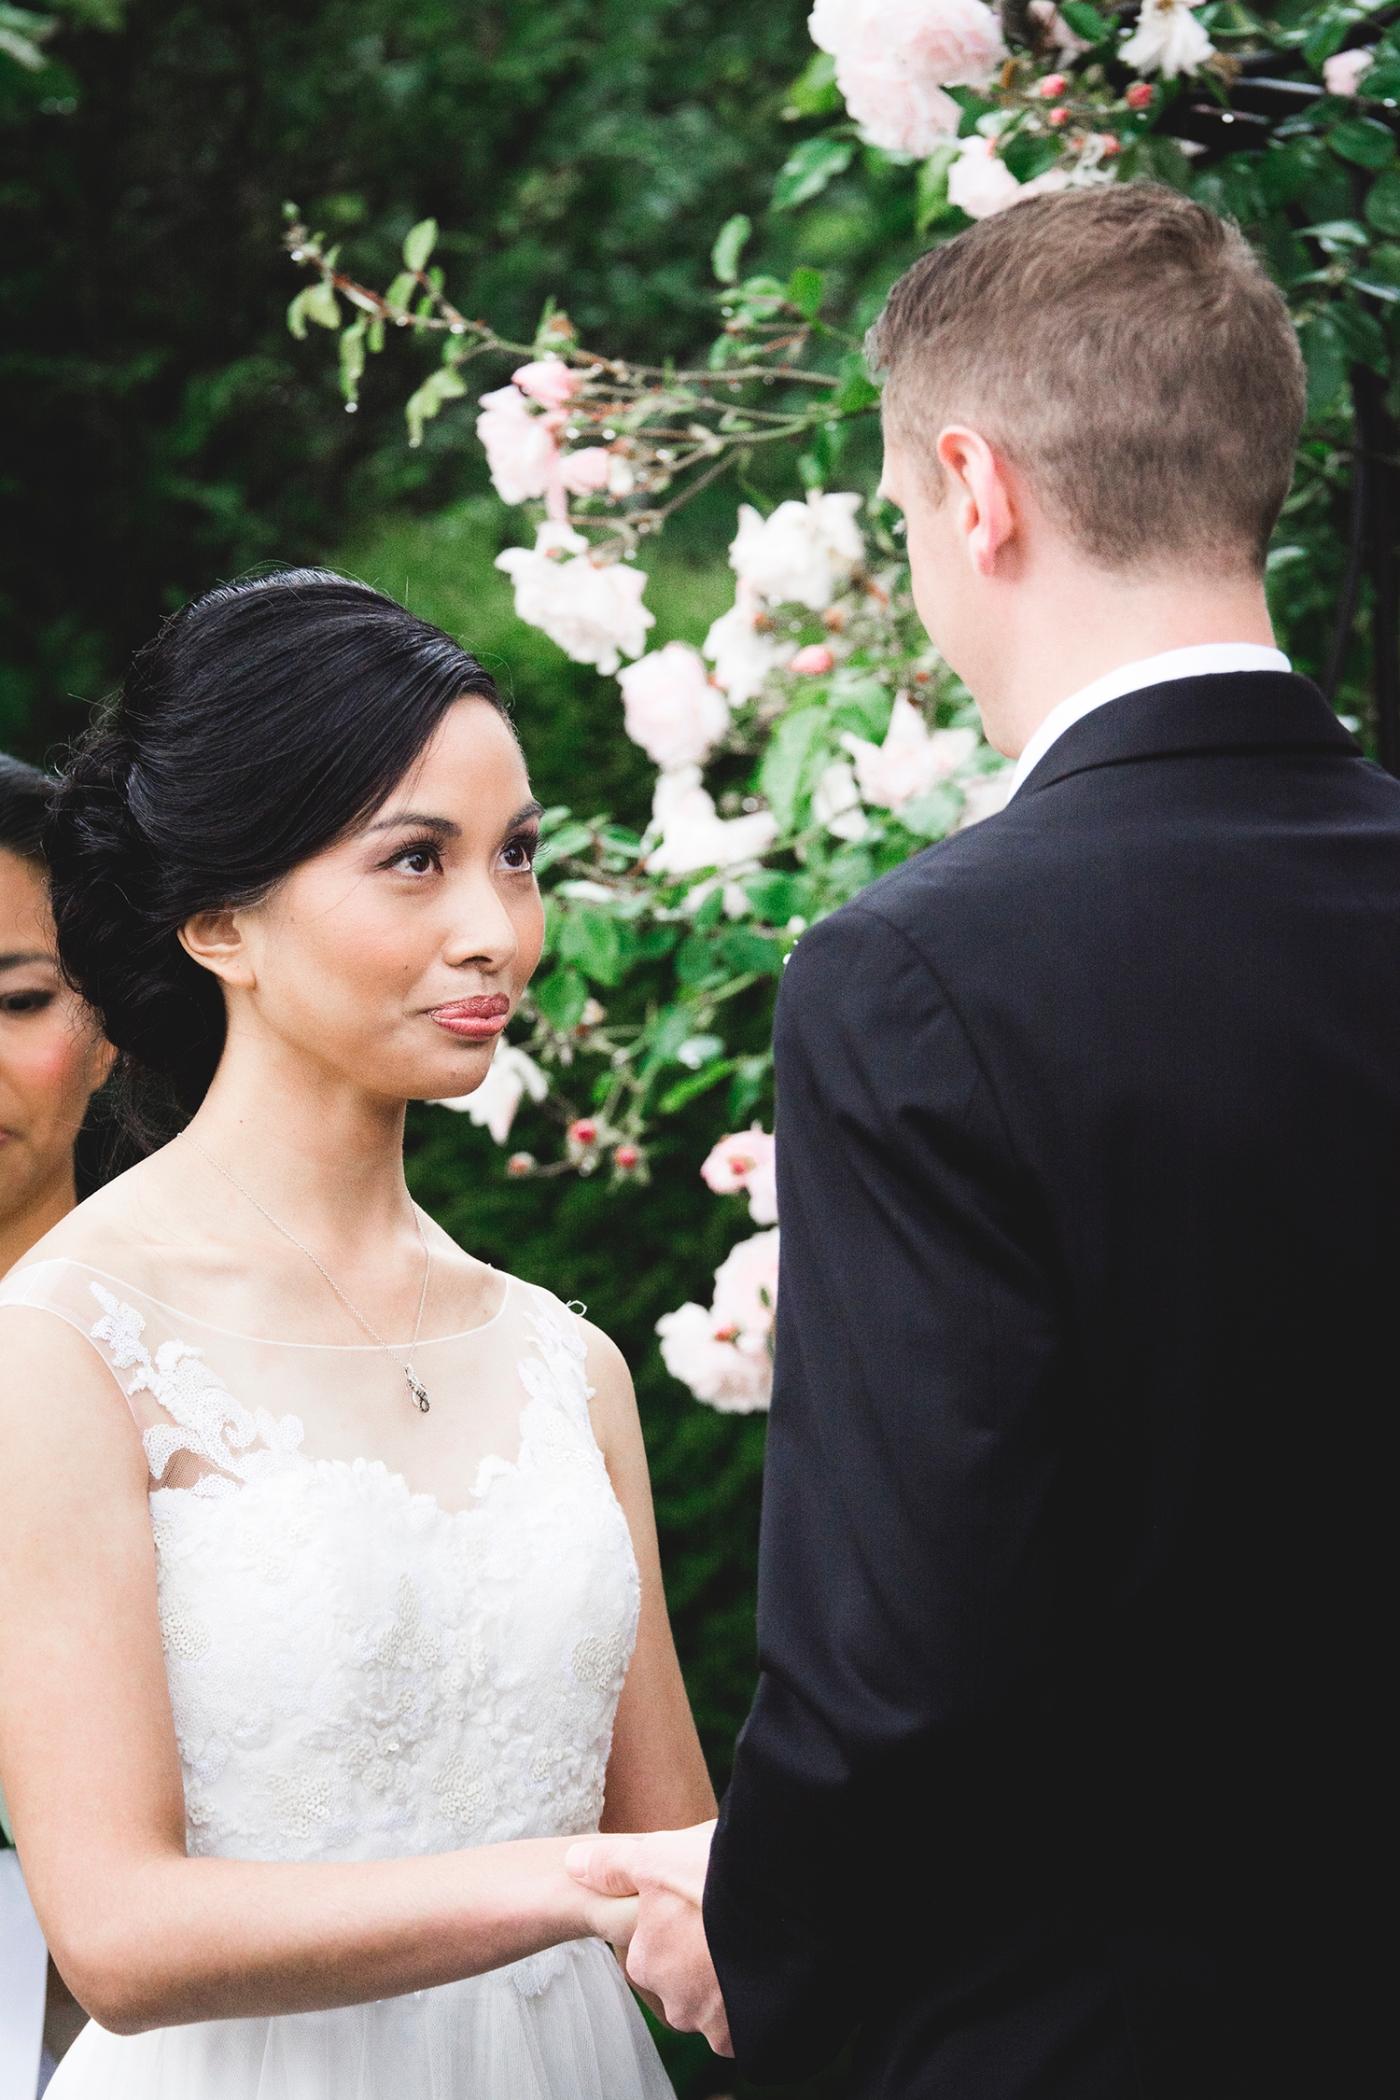 Jane_Speleers_2016_Details_Wedding_Wild_Rose_Estates_Venue_JS7_7774